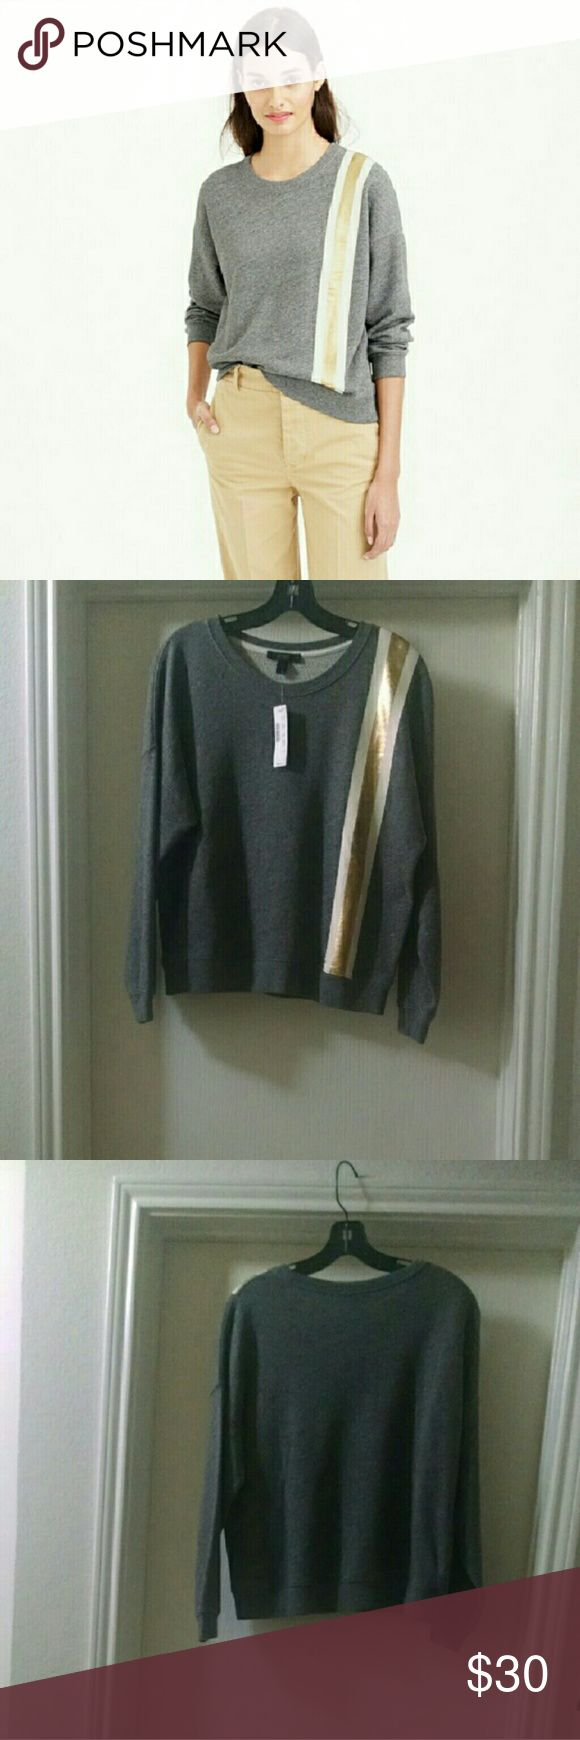 J. Crew Racing Stripe Sweatshirt (S) NWT The classic sweatshirt made even sportier by adding a graphic racing stripe.  Cotton. Machine wash. Loose fit. J. Crew Tops Sweatshirts & Hoodies